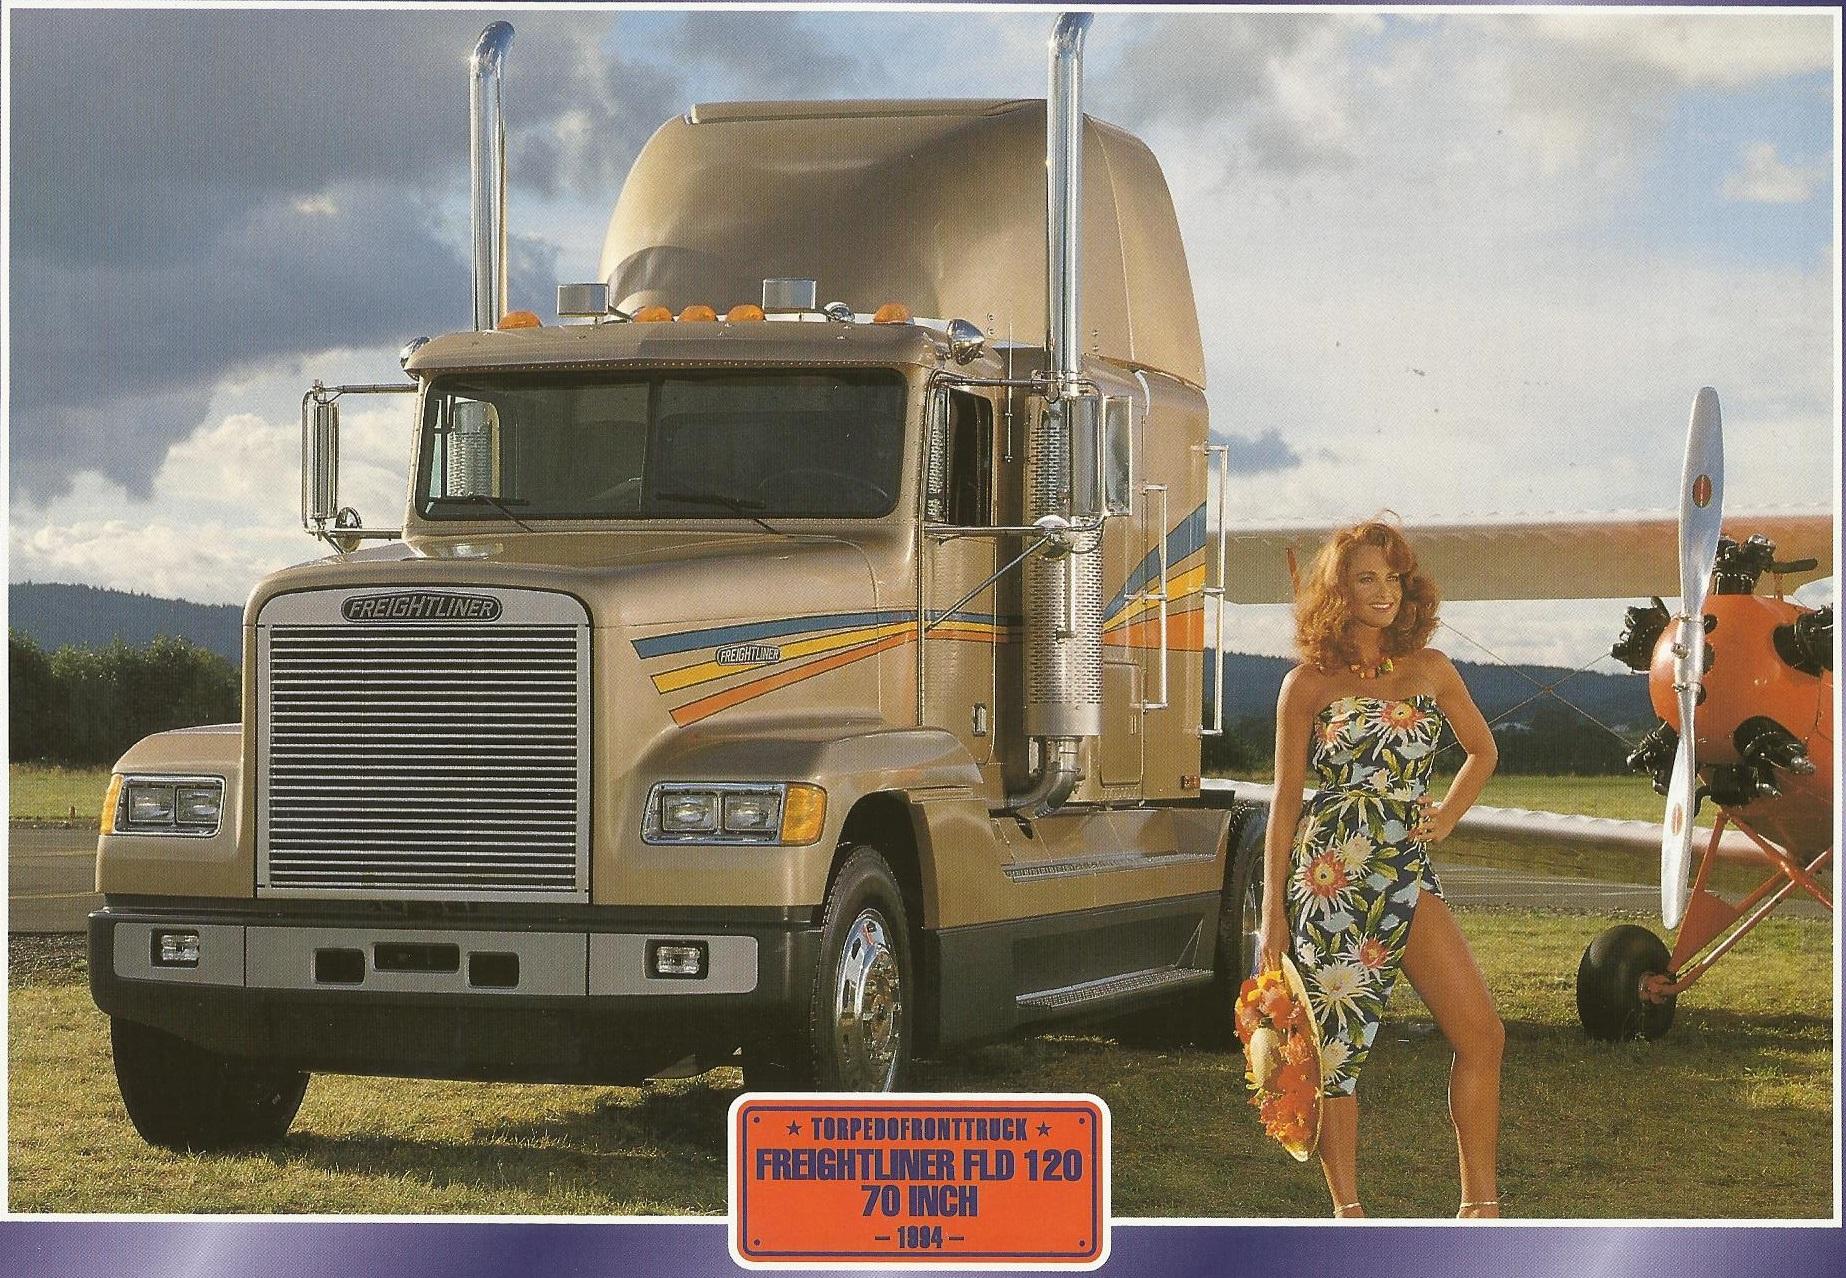 Freightliner-1-003